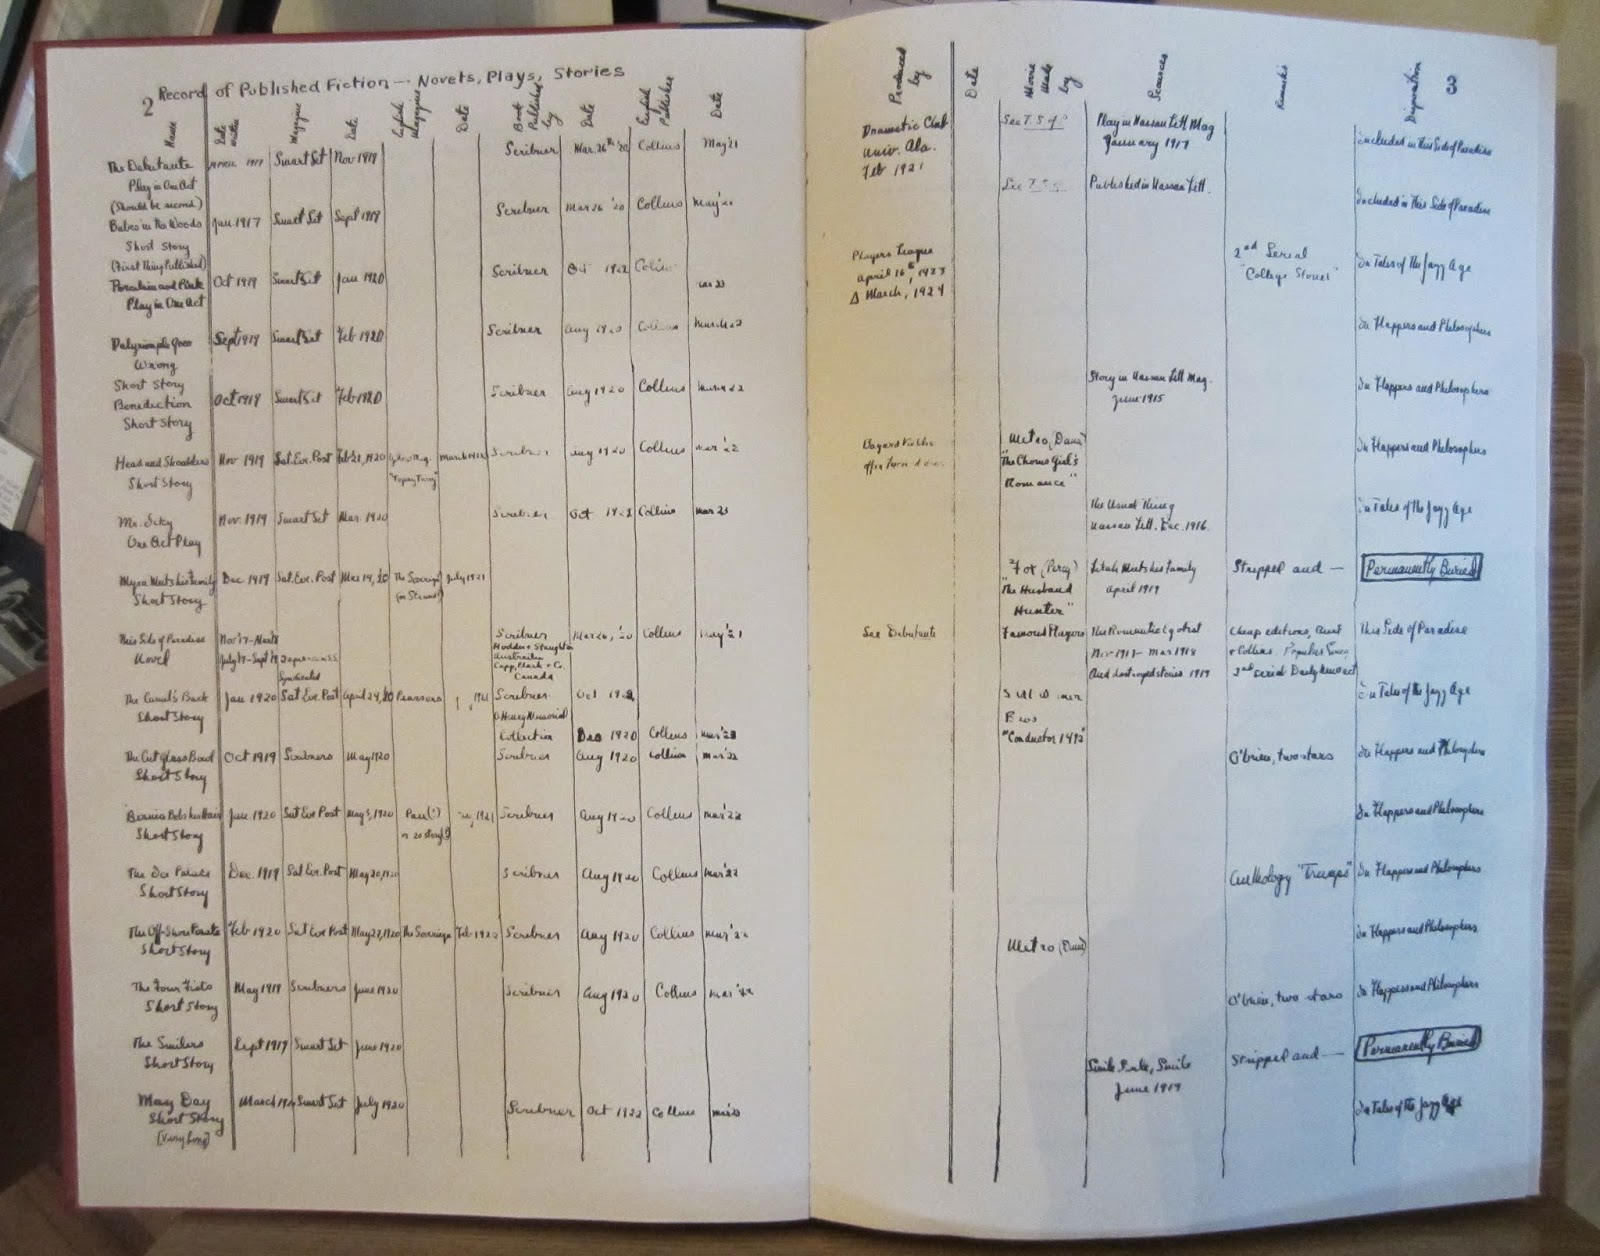 F. Scott Fitzgerald's Ledgers, Fitzgerald Home, Montgomery, AL / Souvenir Chronicles